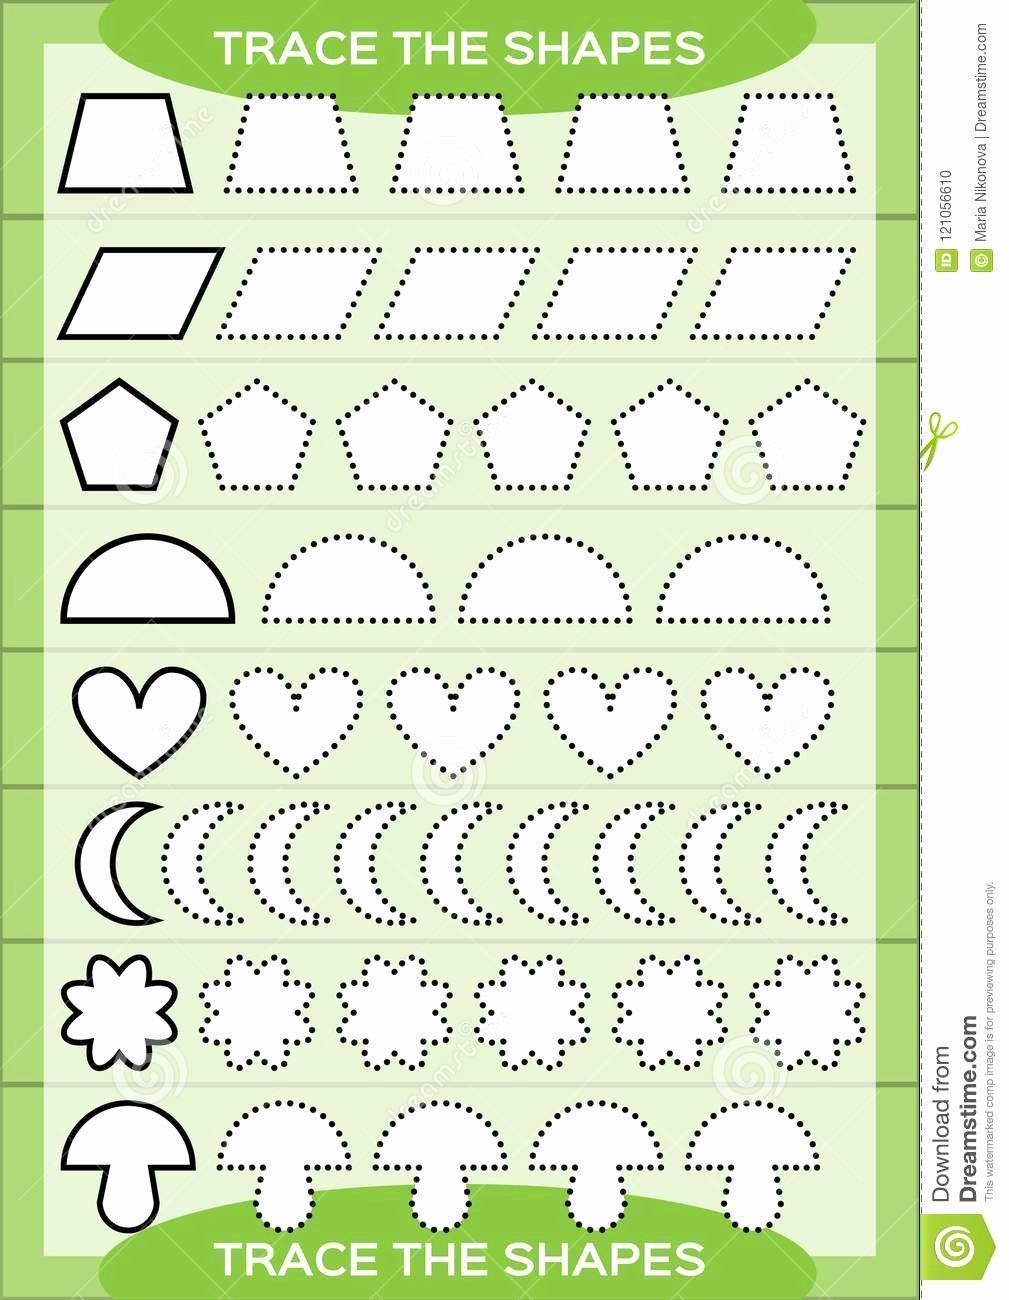 Fine Motor Skills Worksheets for Preschoolers Beautiful Trace the Shapes Kids Education Preschool Worksheet Basic